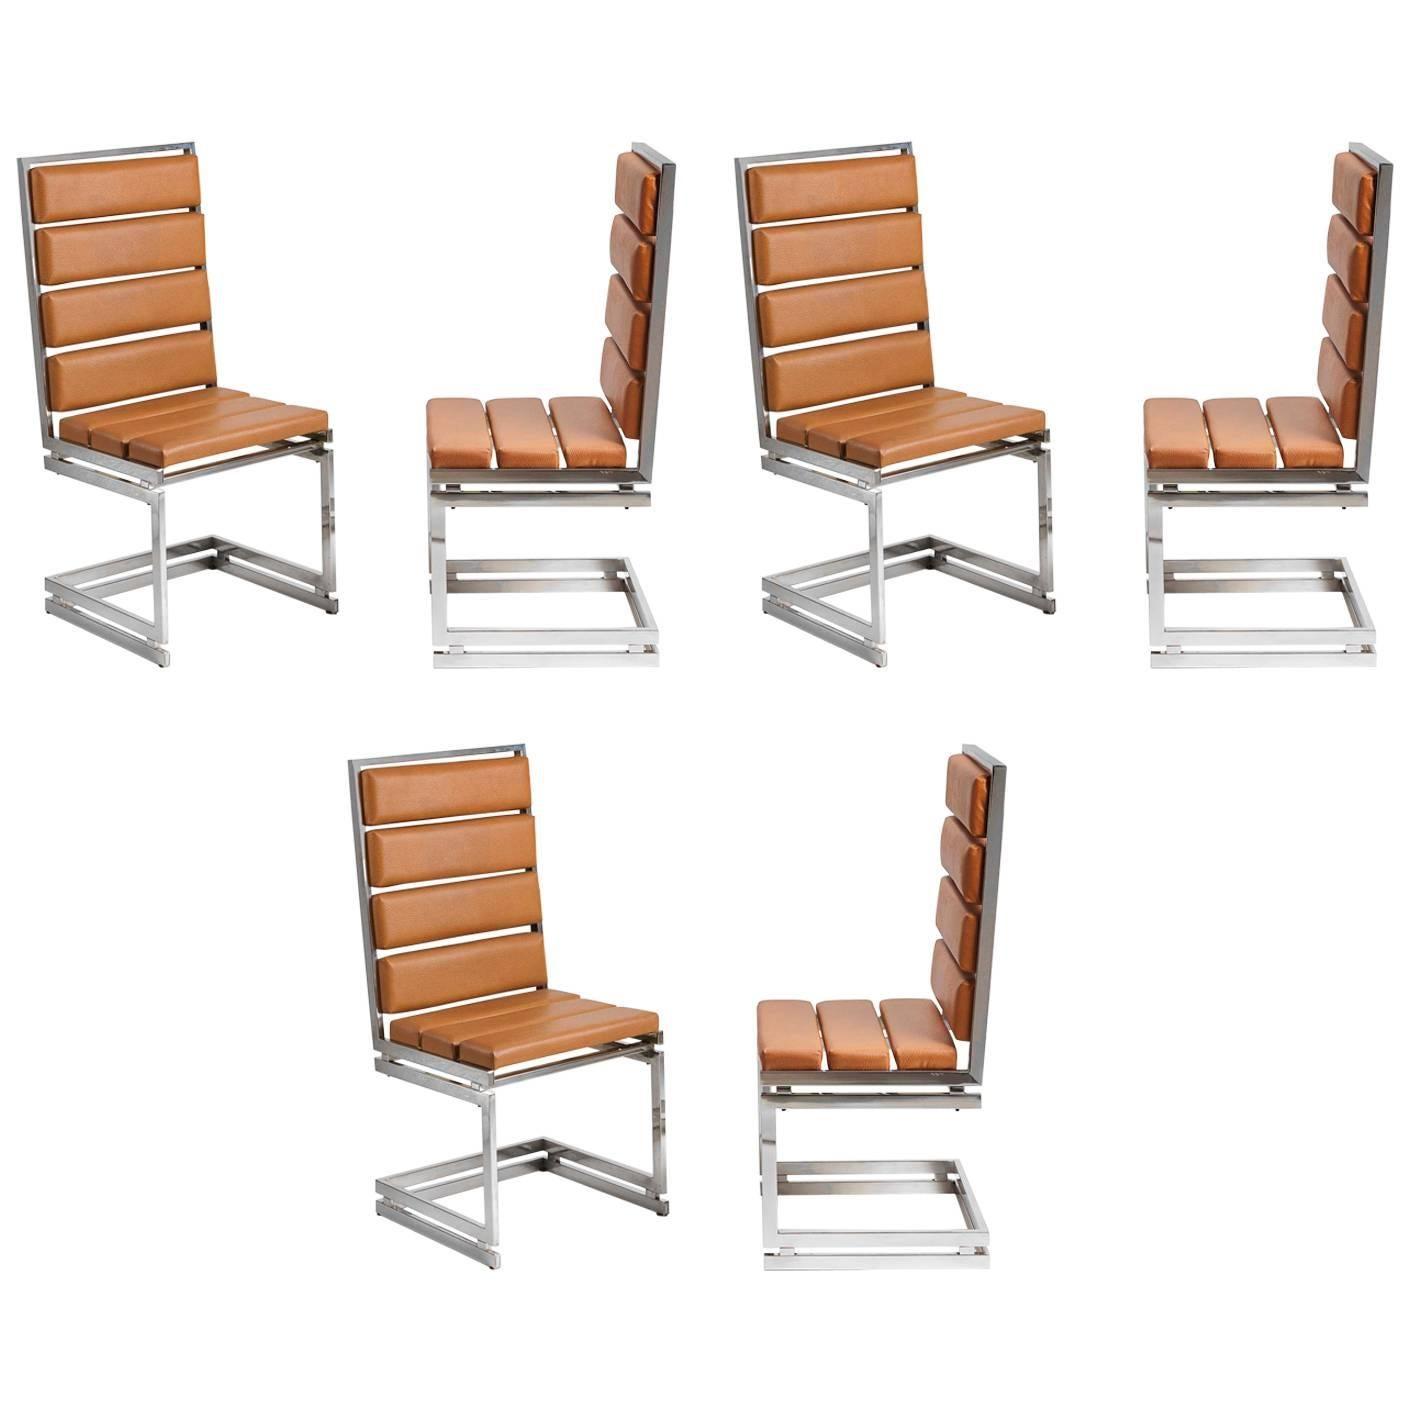 Six Italian Dining Chairs by Romeo Rega 1970s